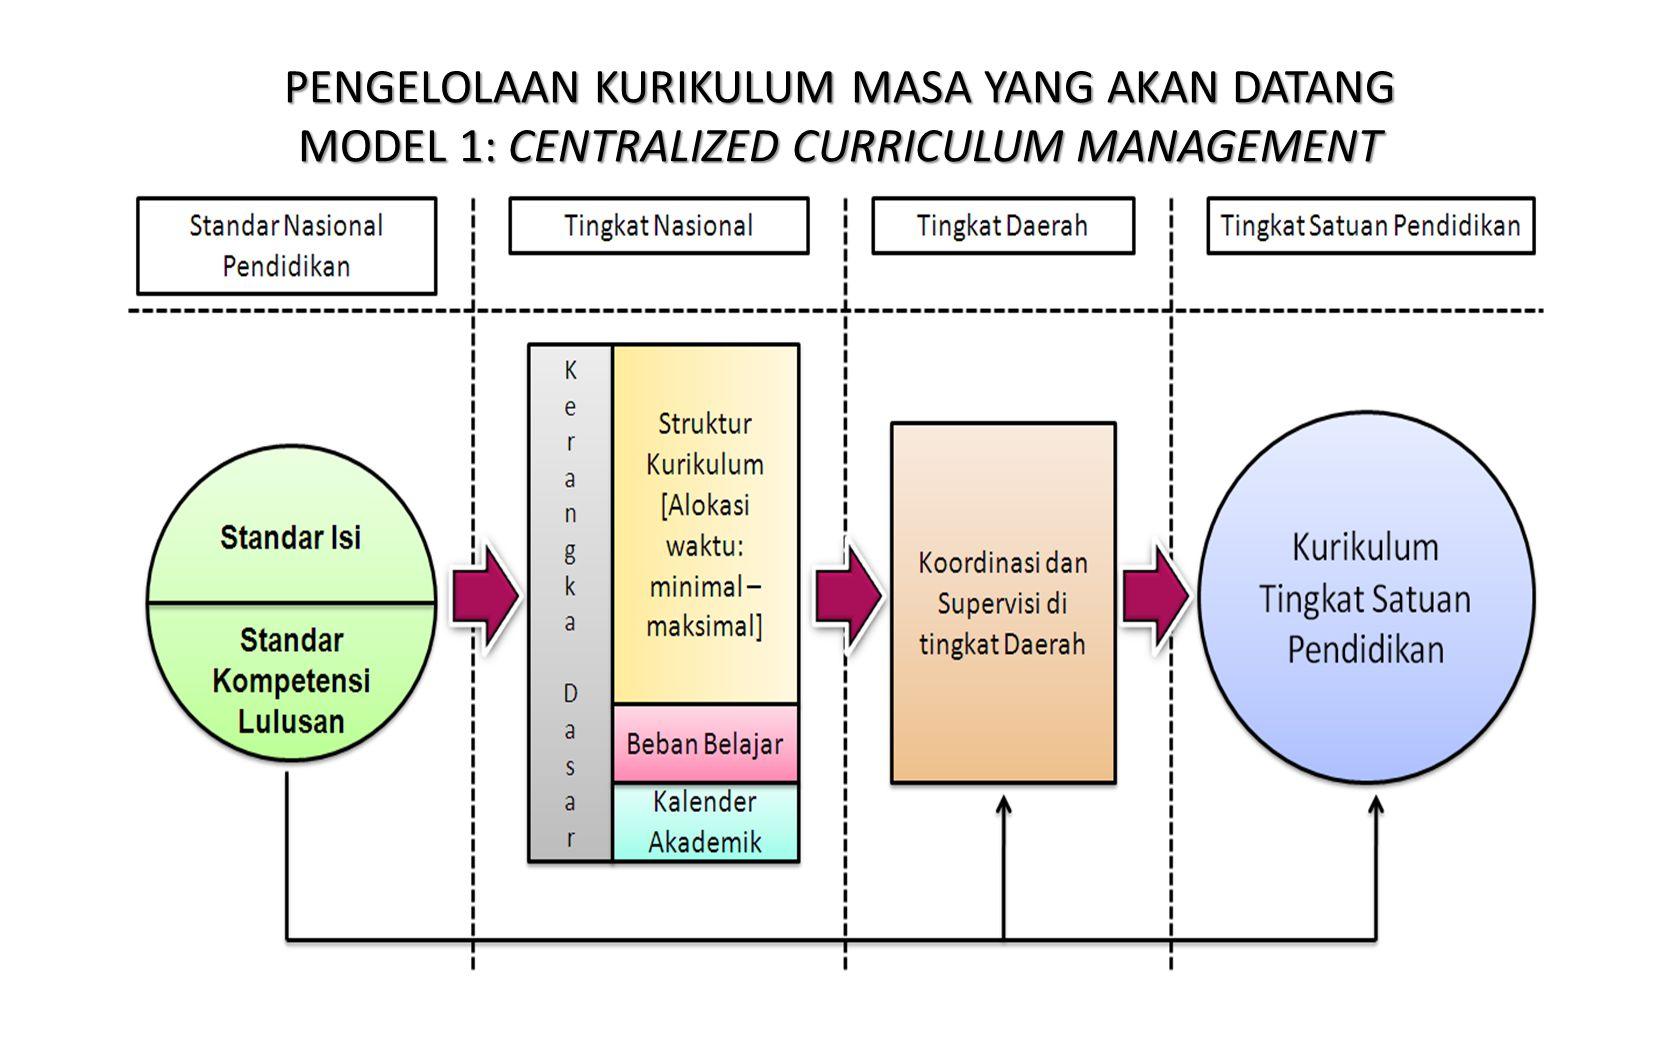 PENGELOLAAN KURIKULUM MASA YANG AKAN DATANG MODEL 1: CENTRALIZED CURRICULUM MANAGEMENT